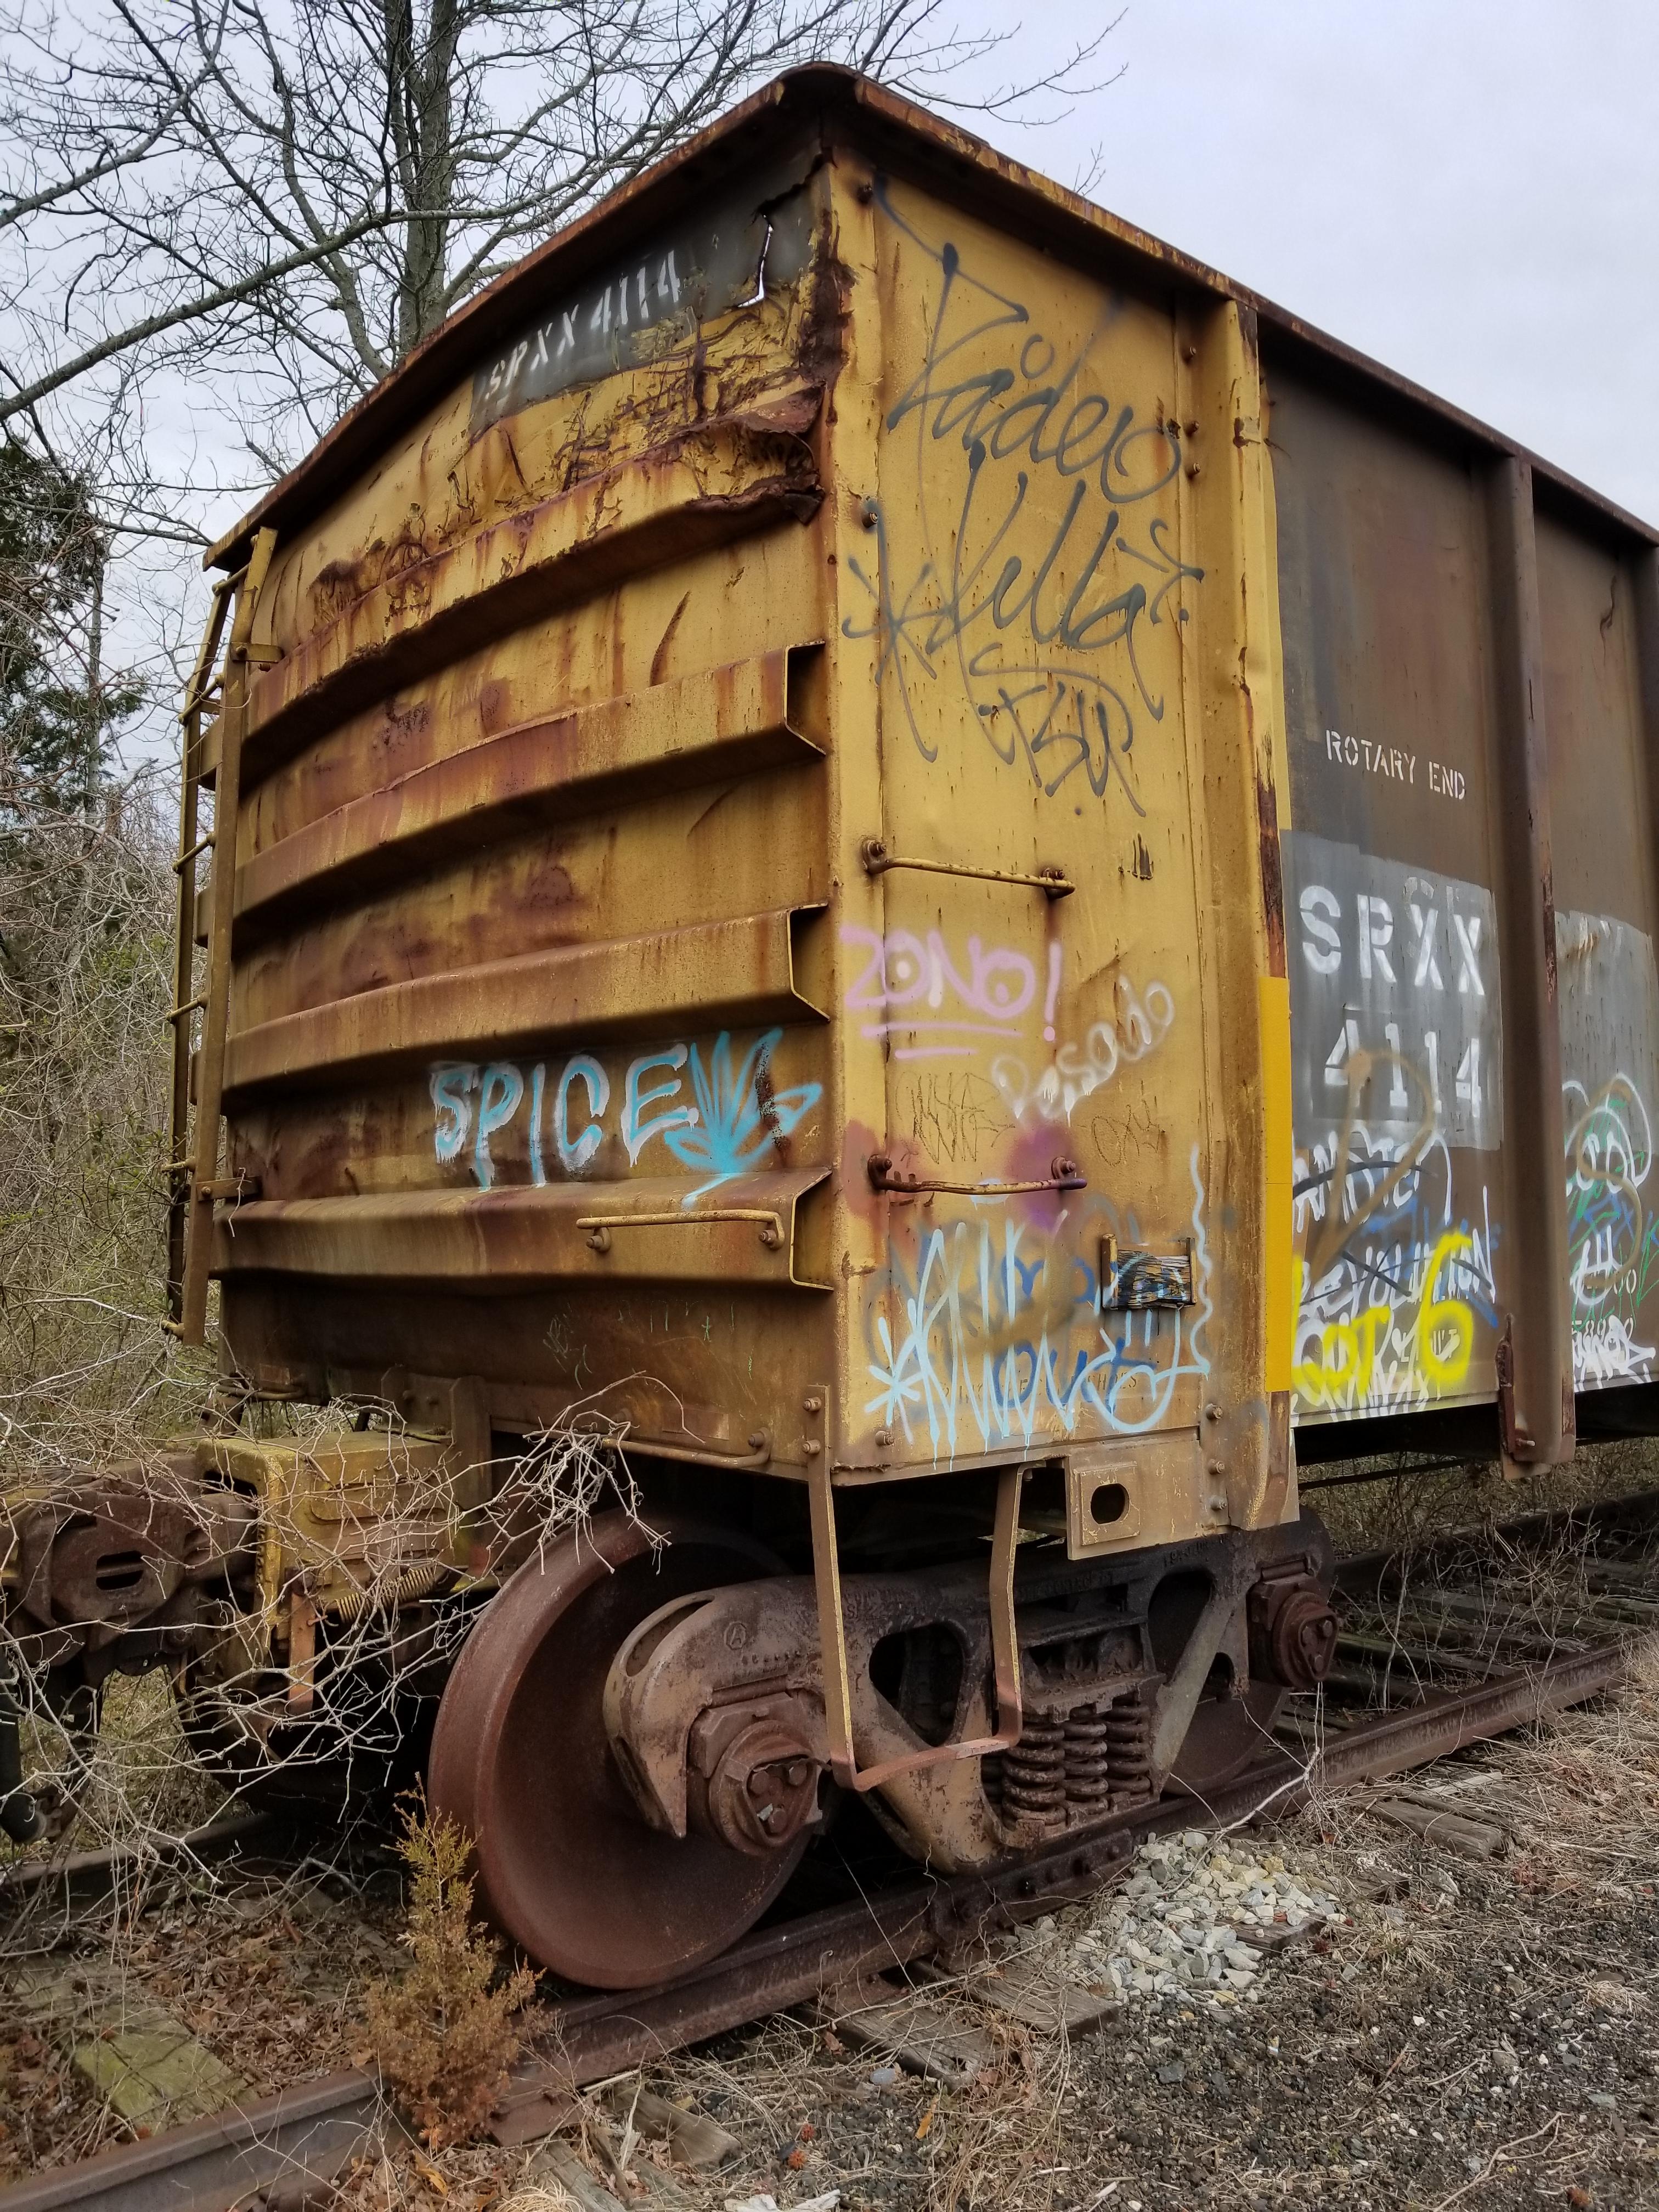 Lot 6 - LOT 6 - (X 4) HIGH-SIDED GONDOLA RAIL CARS (CAPE MAY, NJ) (6-1) SRXX 4304 HIGH-SIDED GONDOLA RAIL